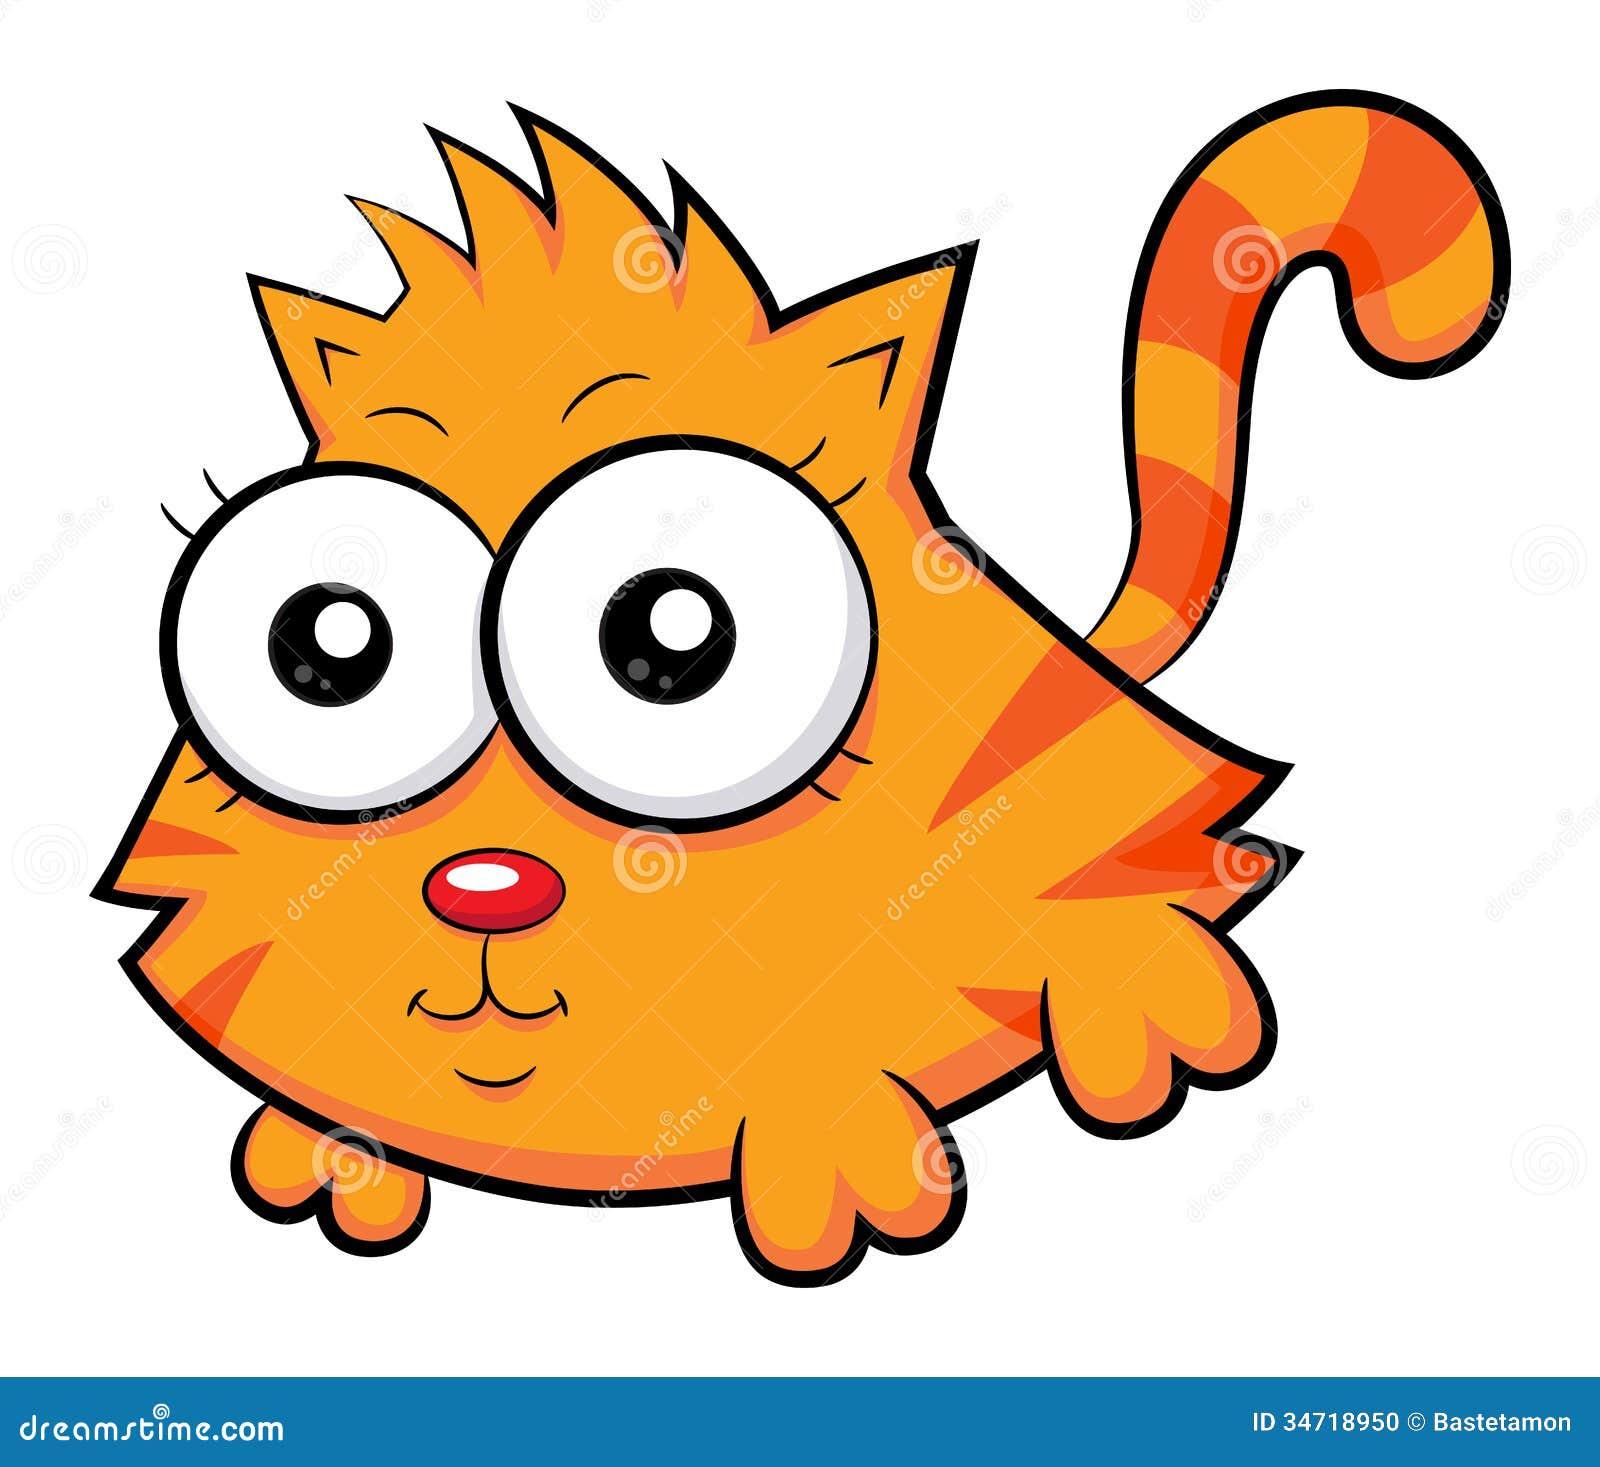 Cute Cat Stock Photo - Image: 34718950